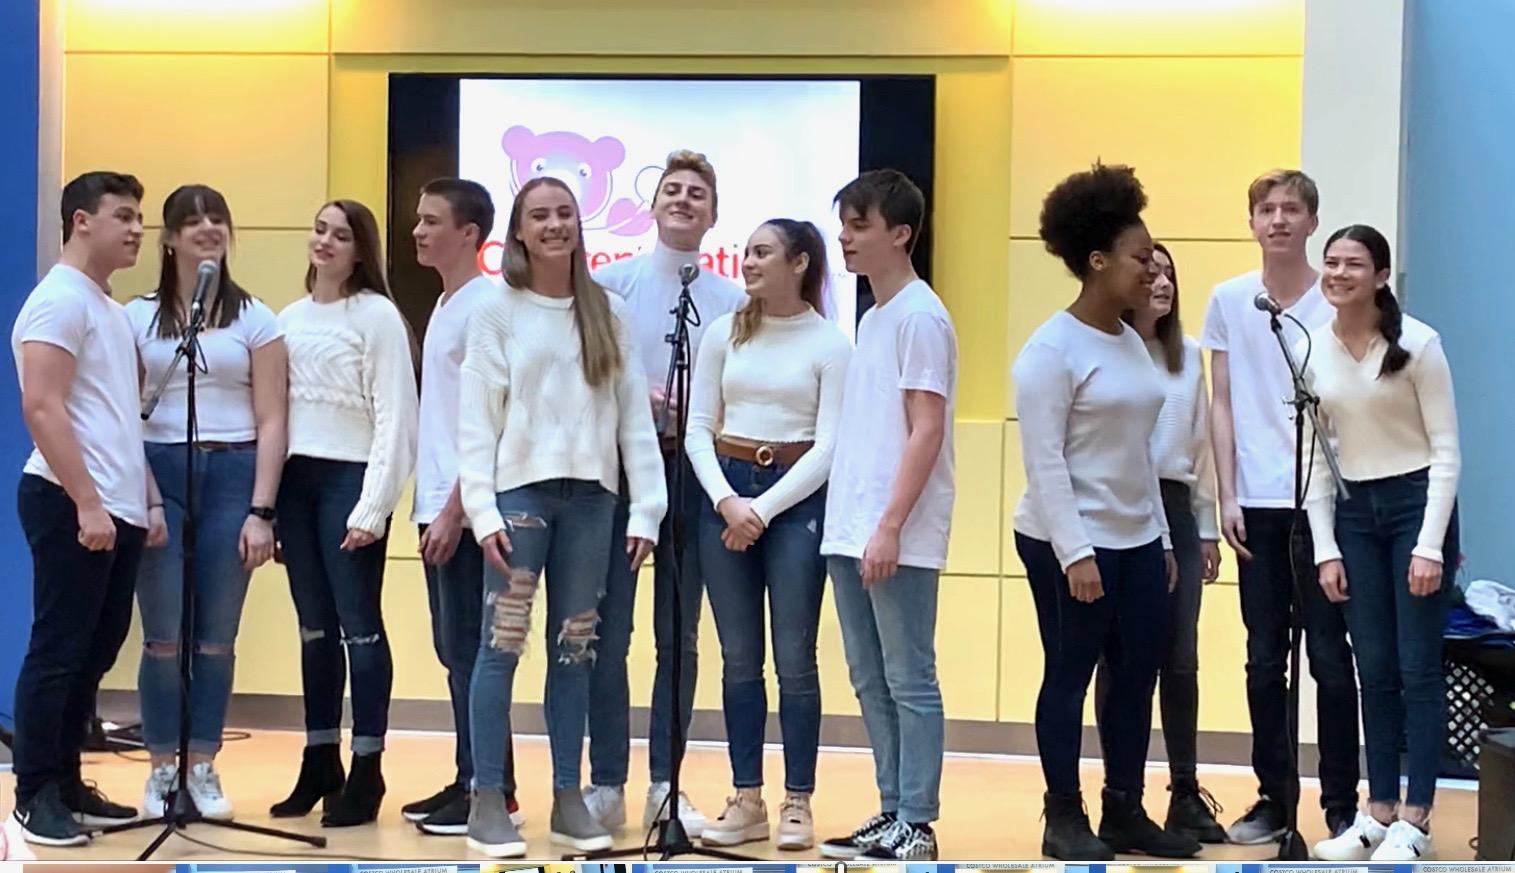 Metropolitan School of the Arts' 24-Hour Facebook Watch Party to Support Performing Arts School